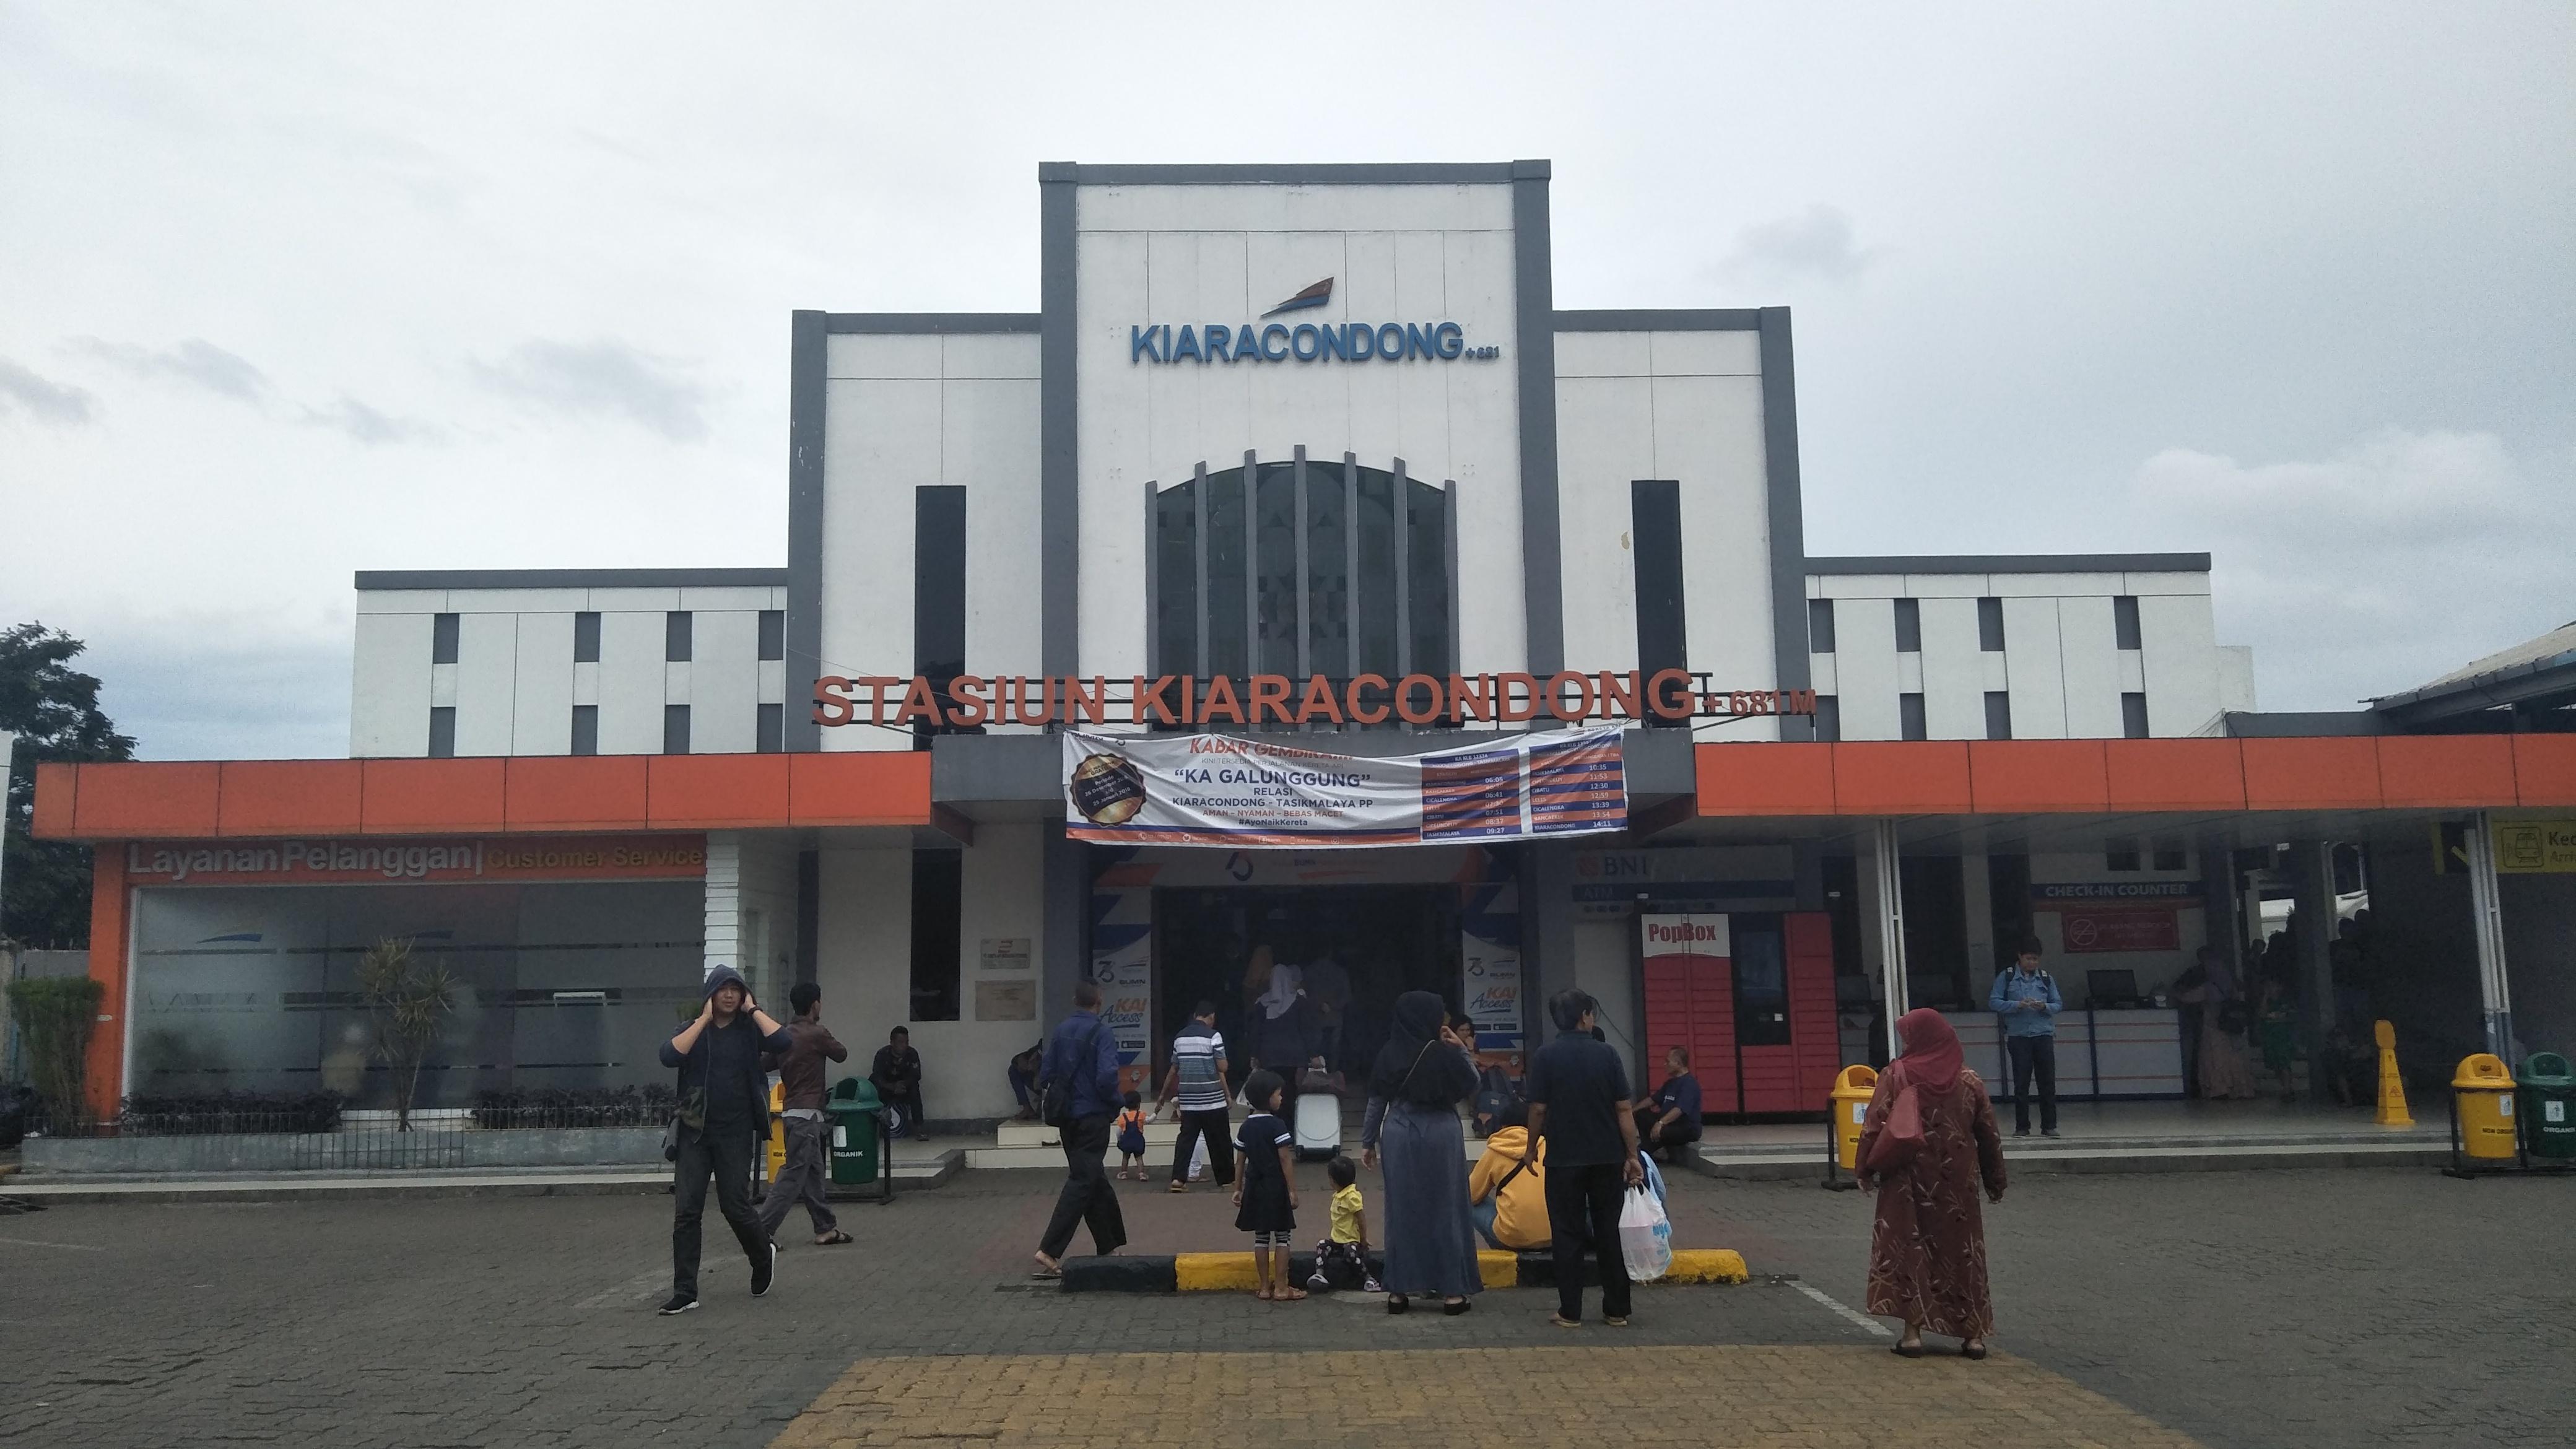 Kiaracondong Railway Station Wikipedia